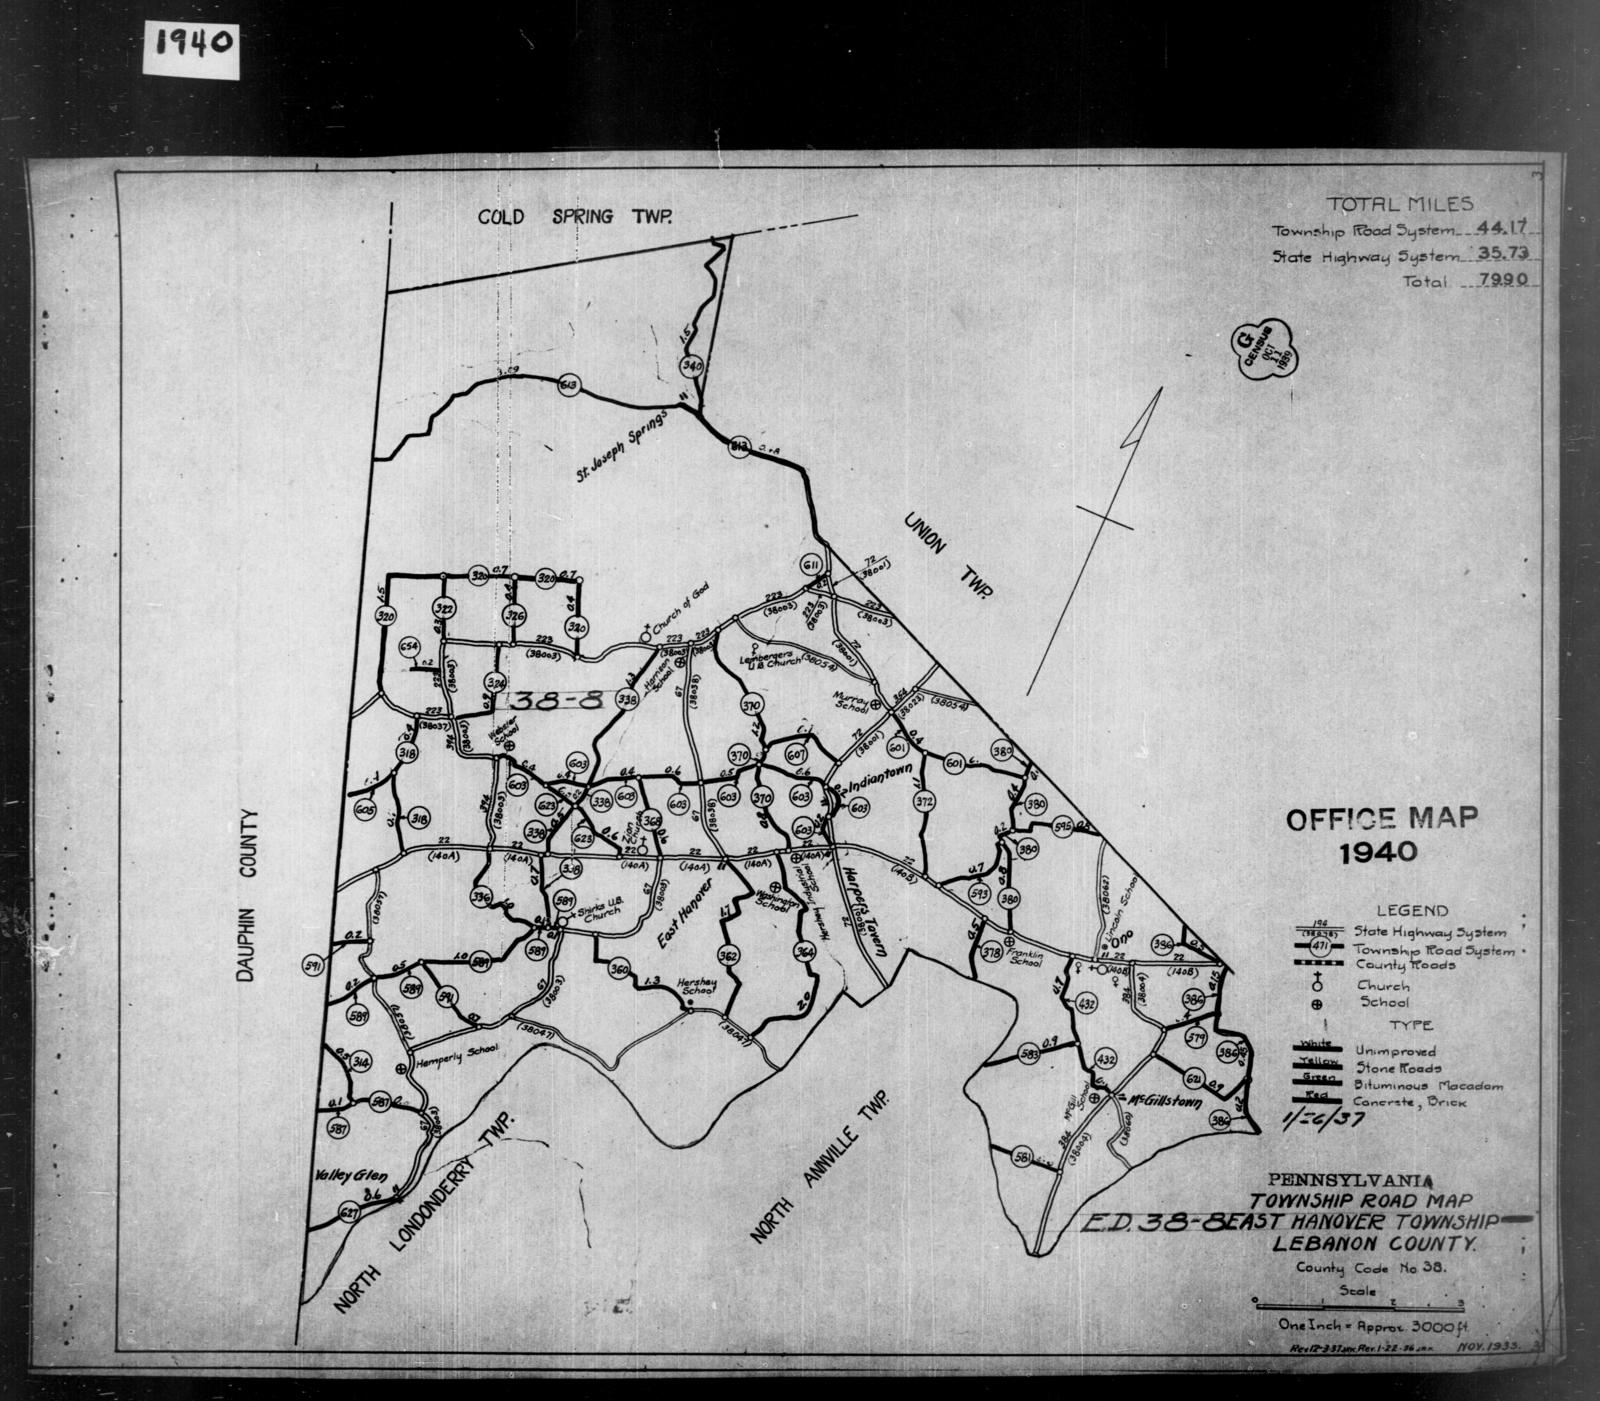 1940 Census Enumeration District Maps - Pennsylvania ...